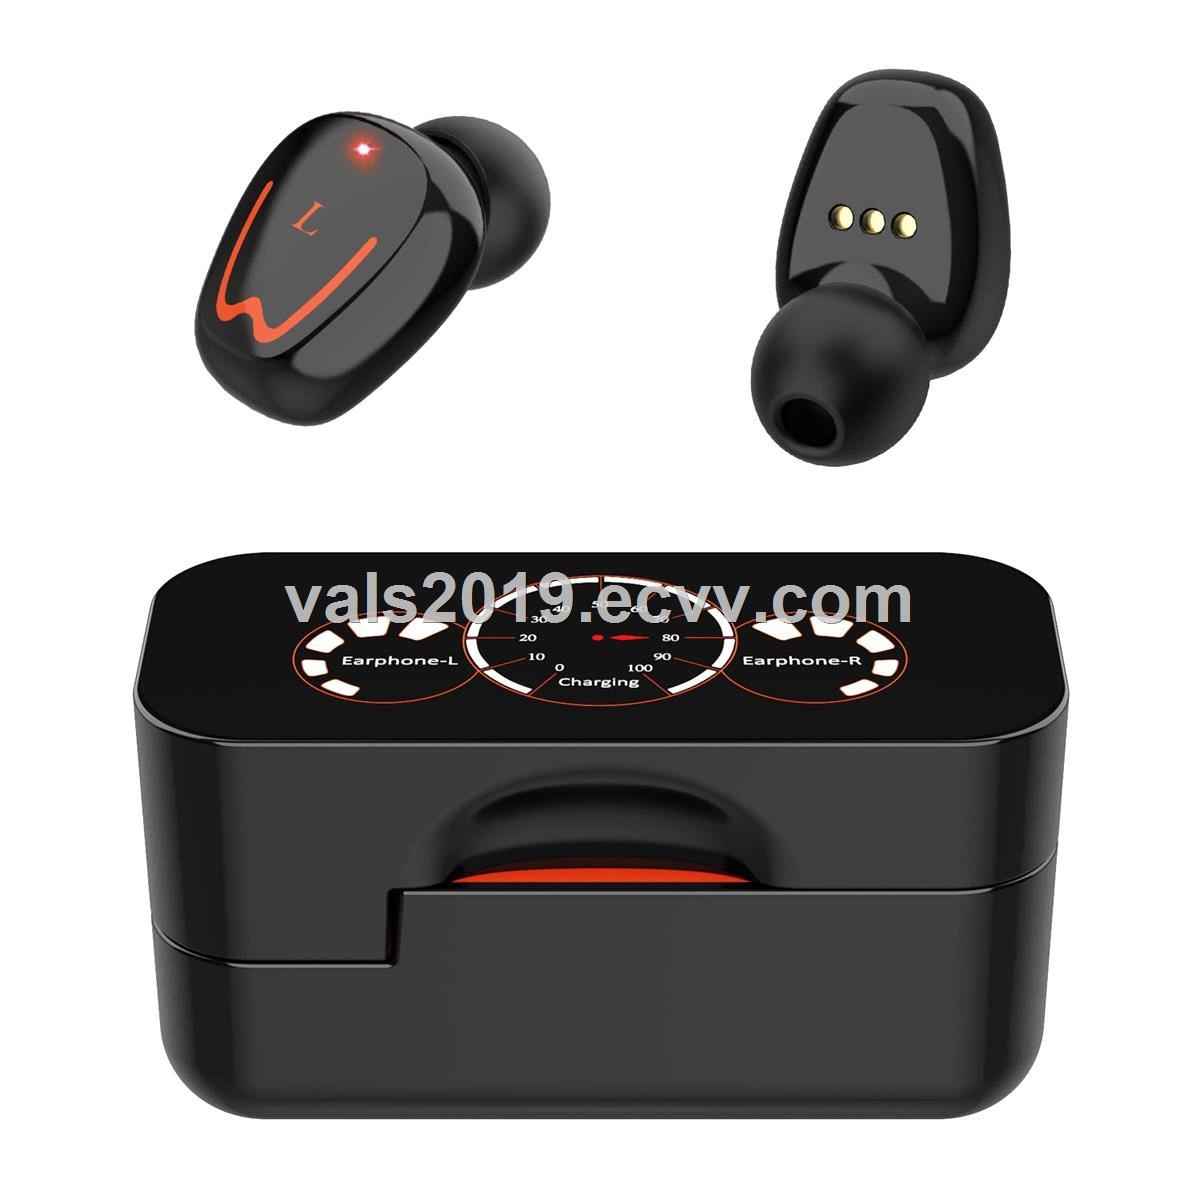 New car instrument bluetooth earbudswireless earphoneTWS headphoneheadset